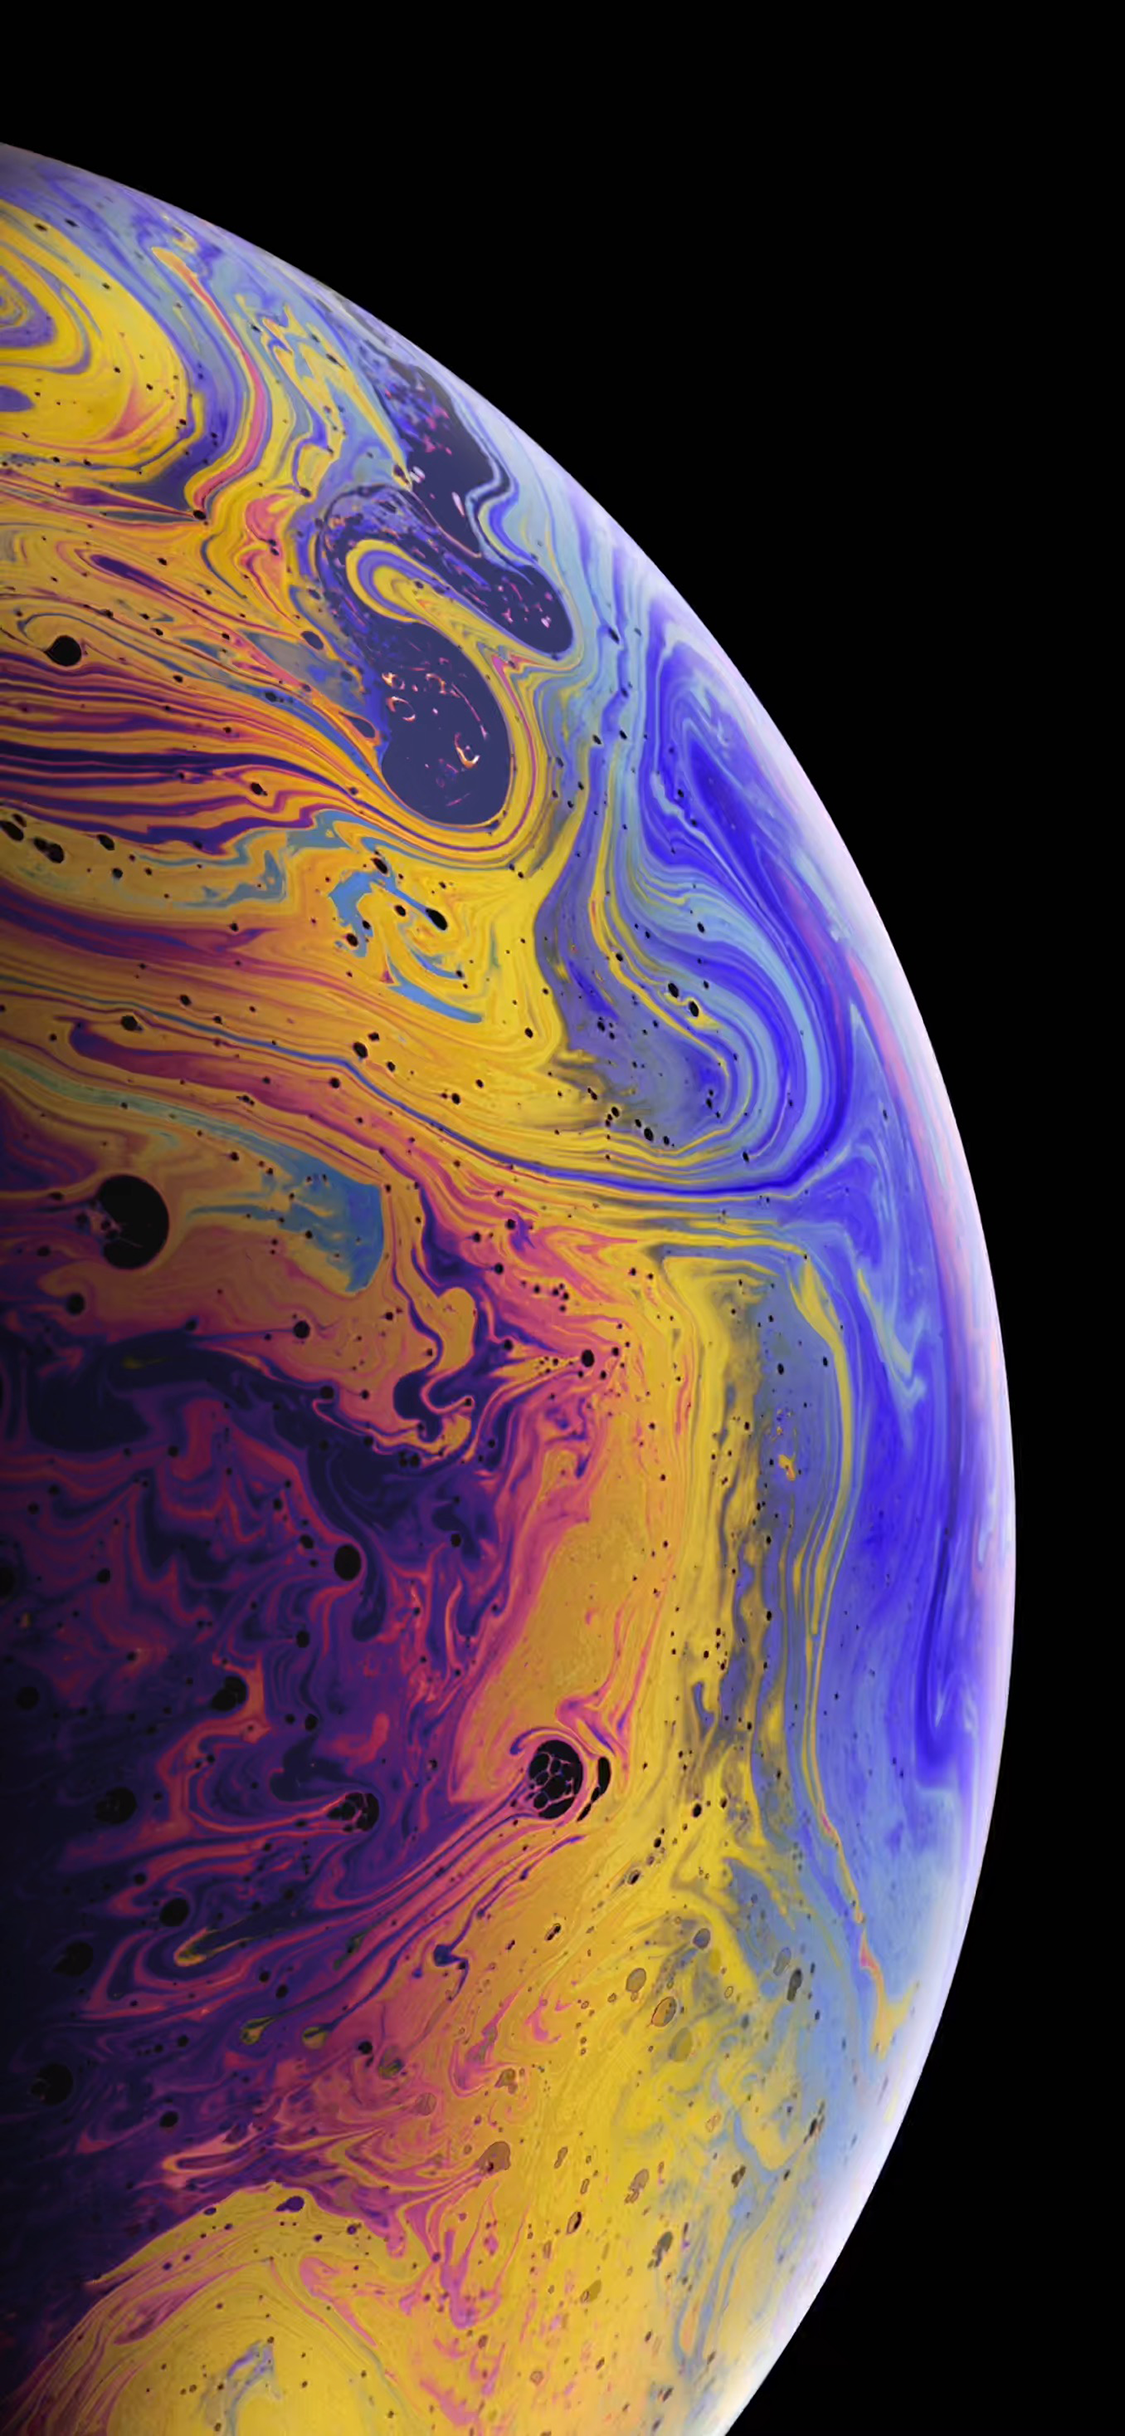 iPhone Xs Wallpaper